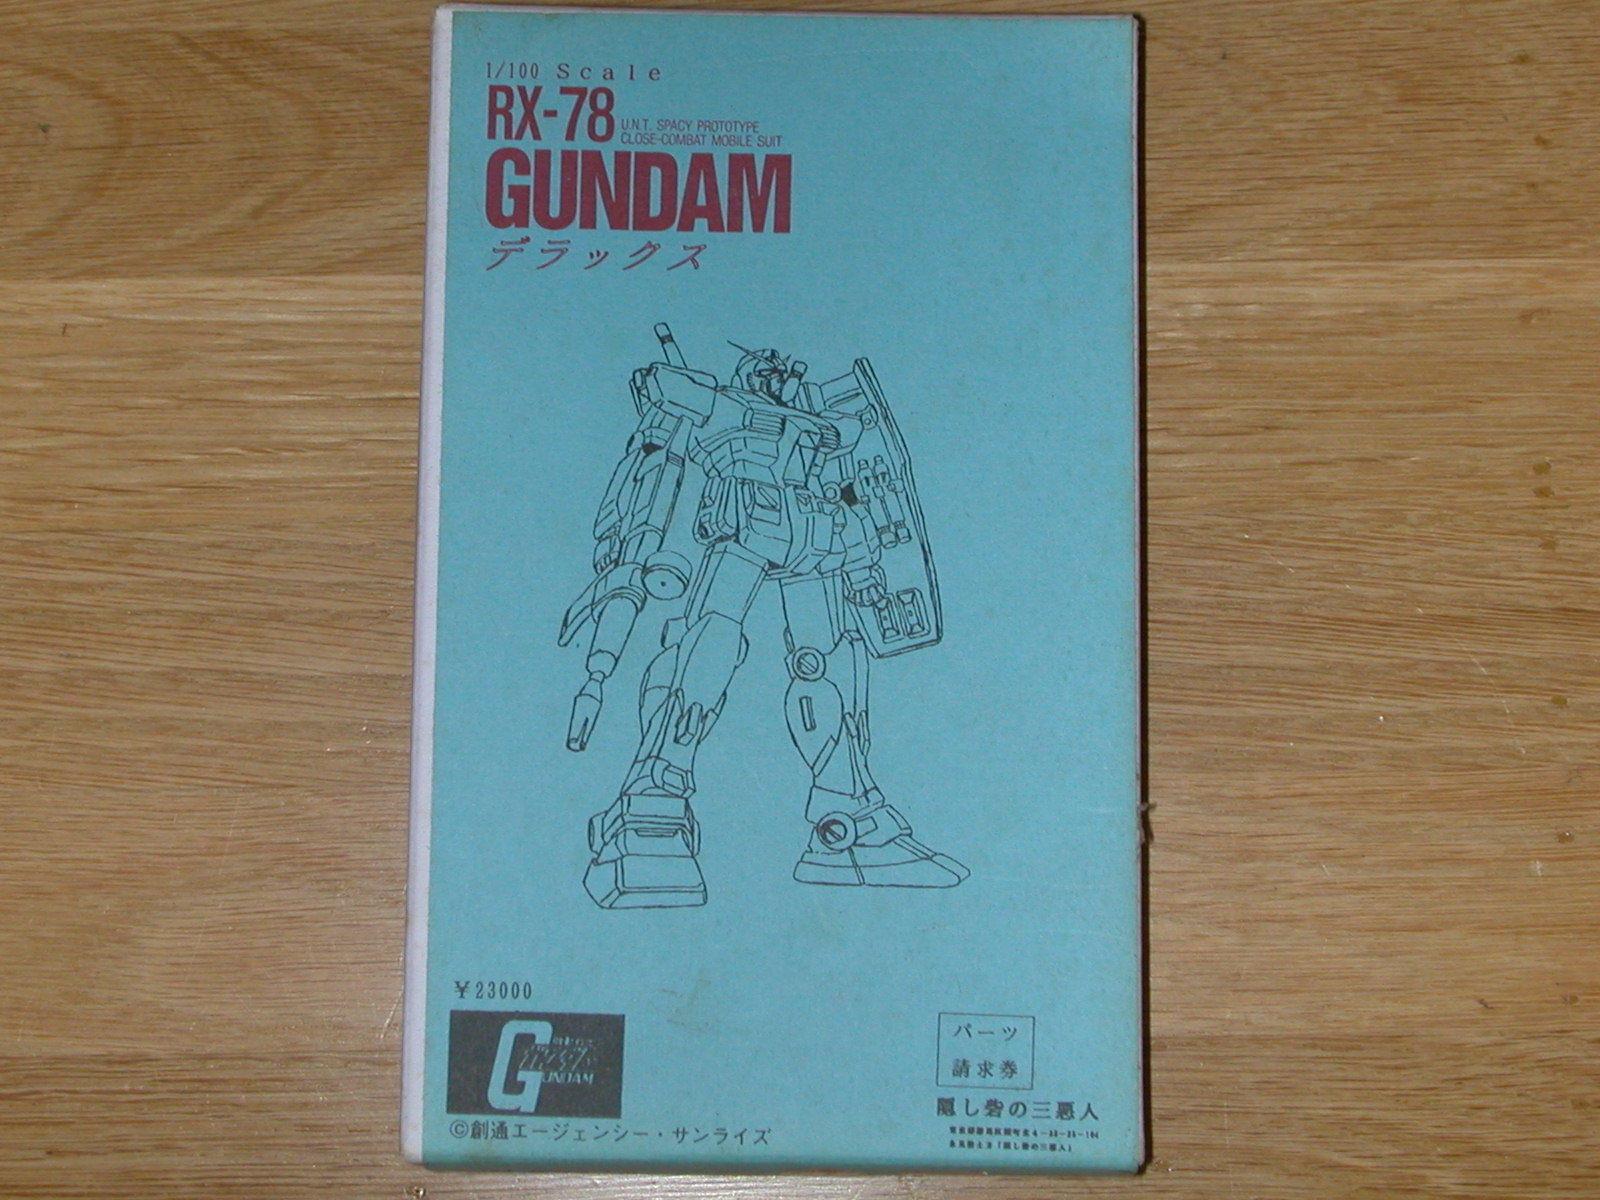 Gundam RX-78 Deluxe 1 100 scale resin (Hidden Fort People JAF'CON 1992) Gundam